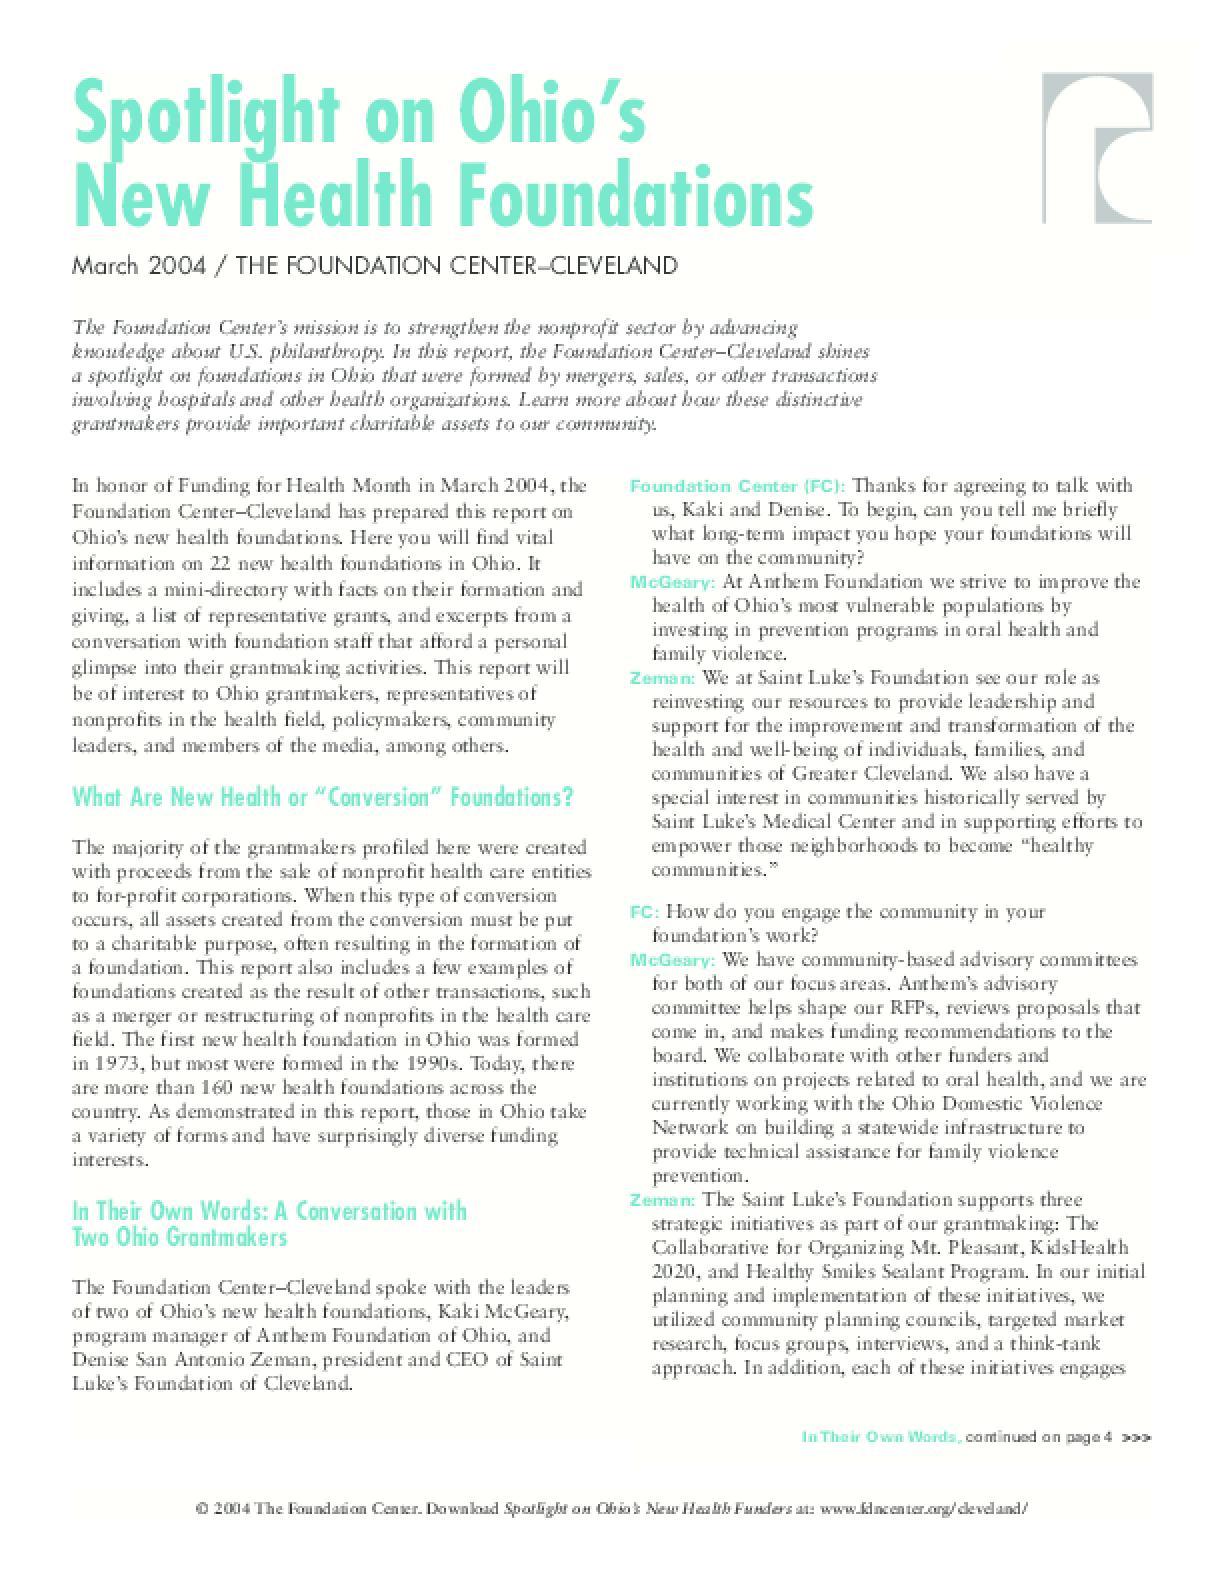 Spotlight on Ohio's New Health Foundations